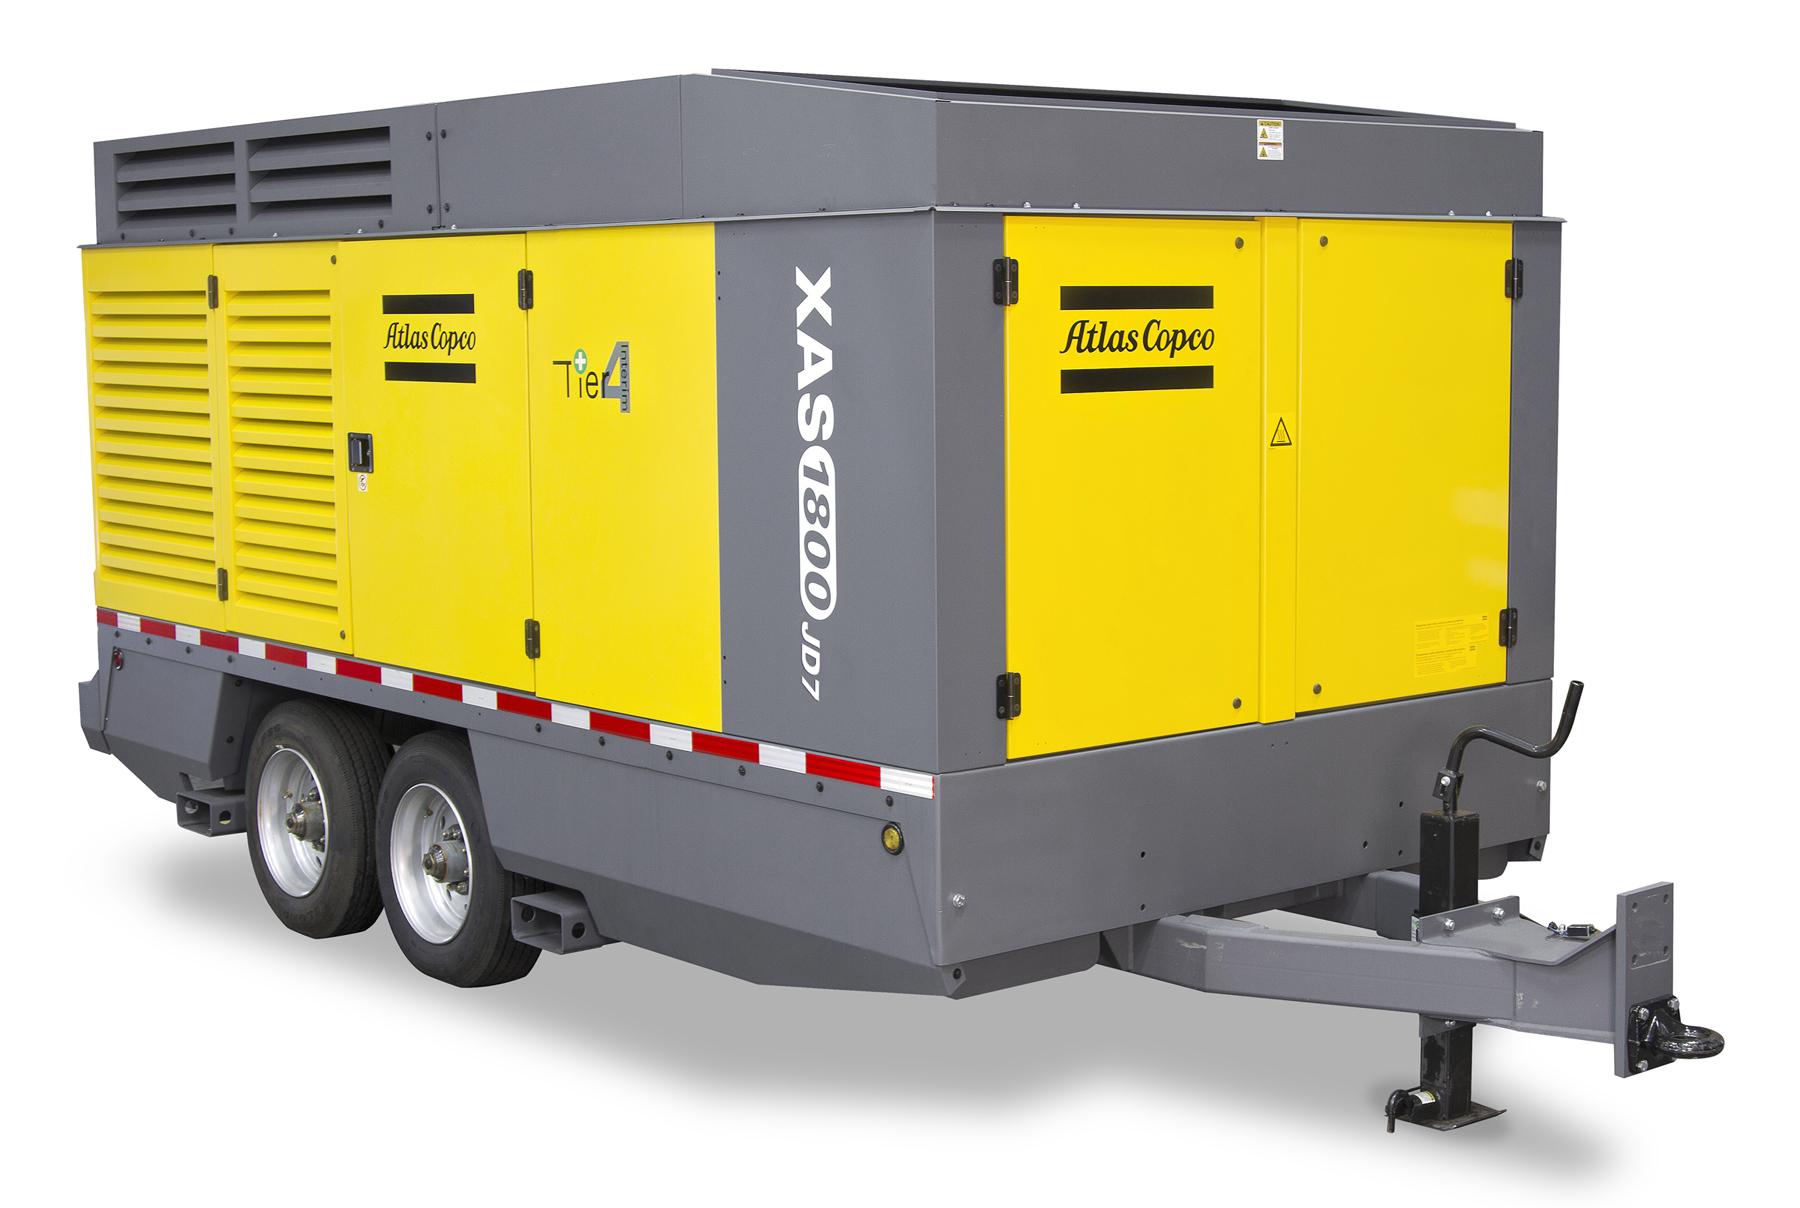 Atlas Copco Compressors | Phone 813-247-7231 | Tampa, FL, United States